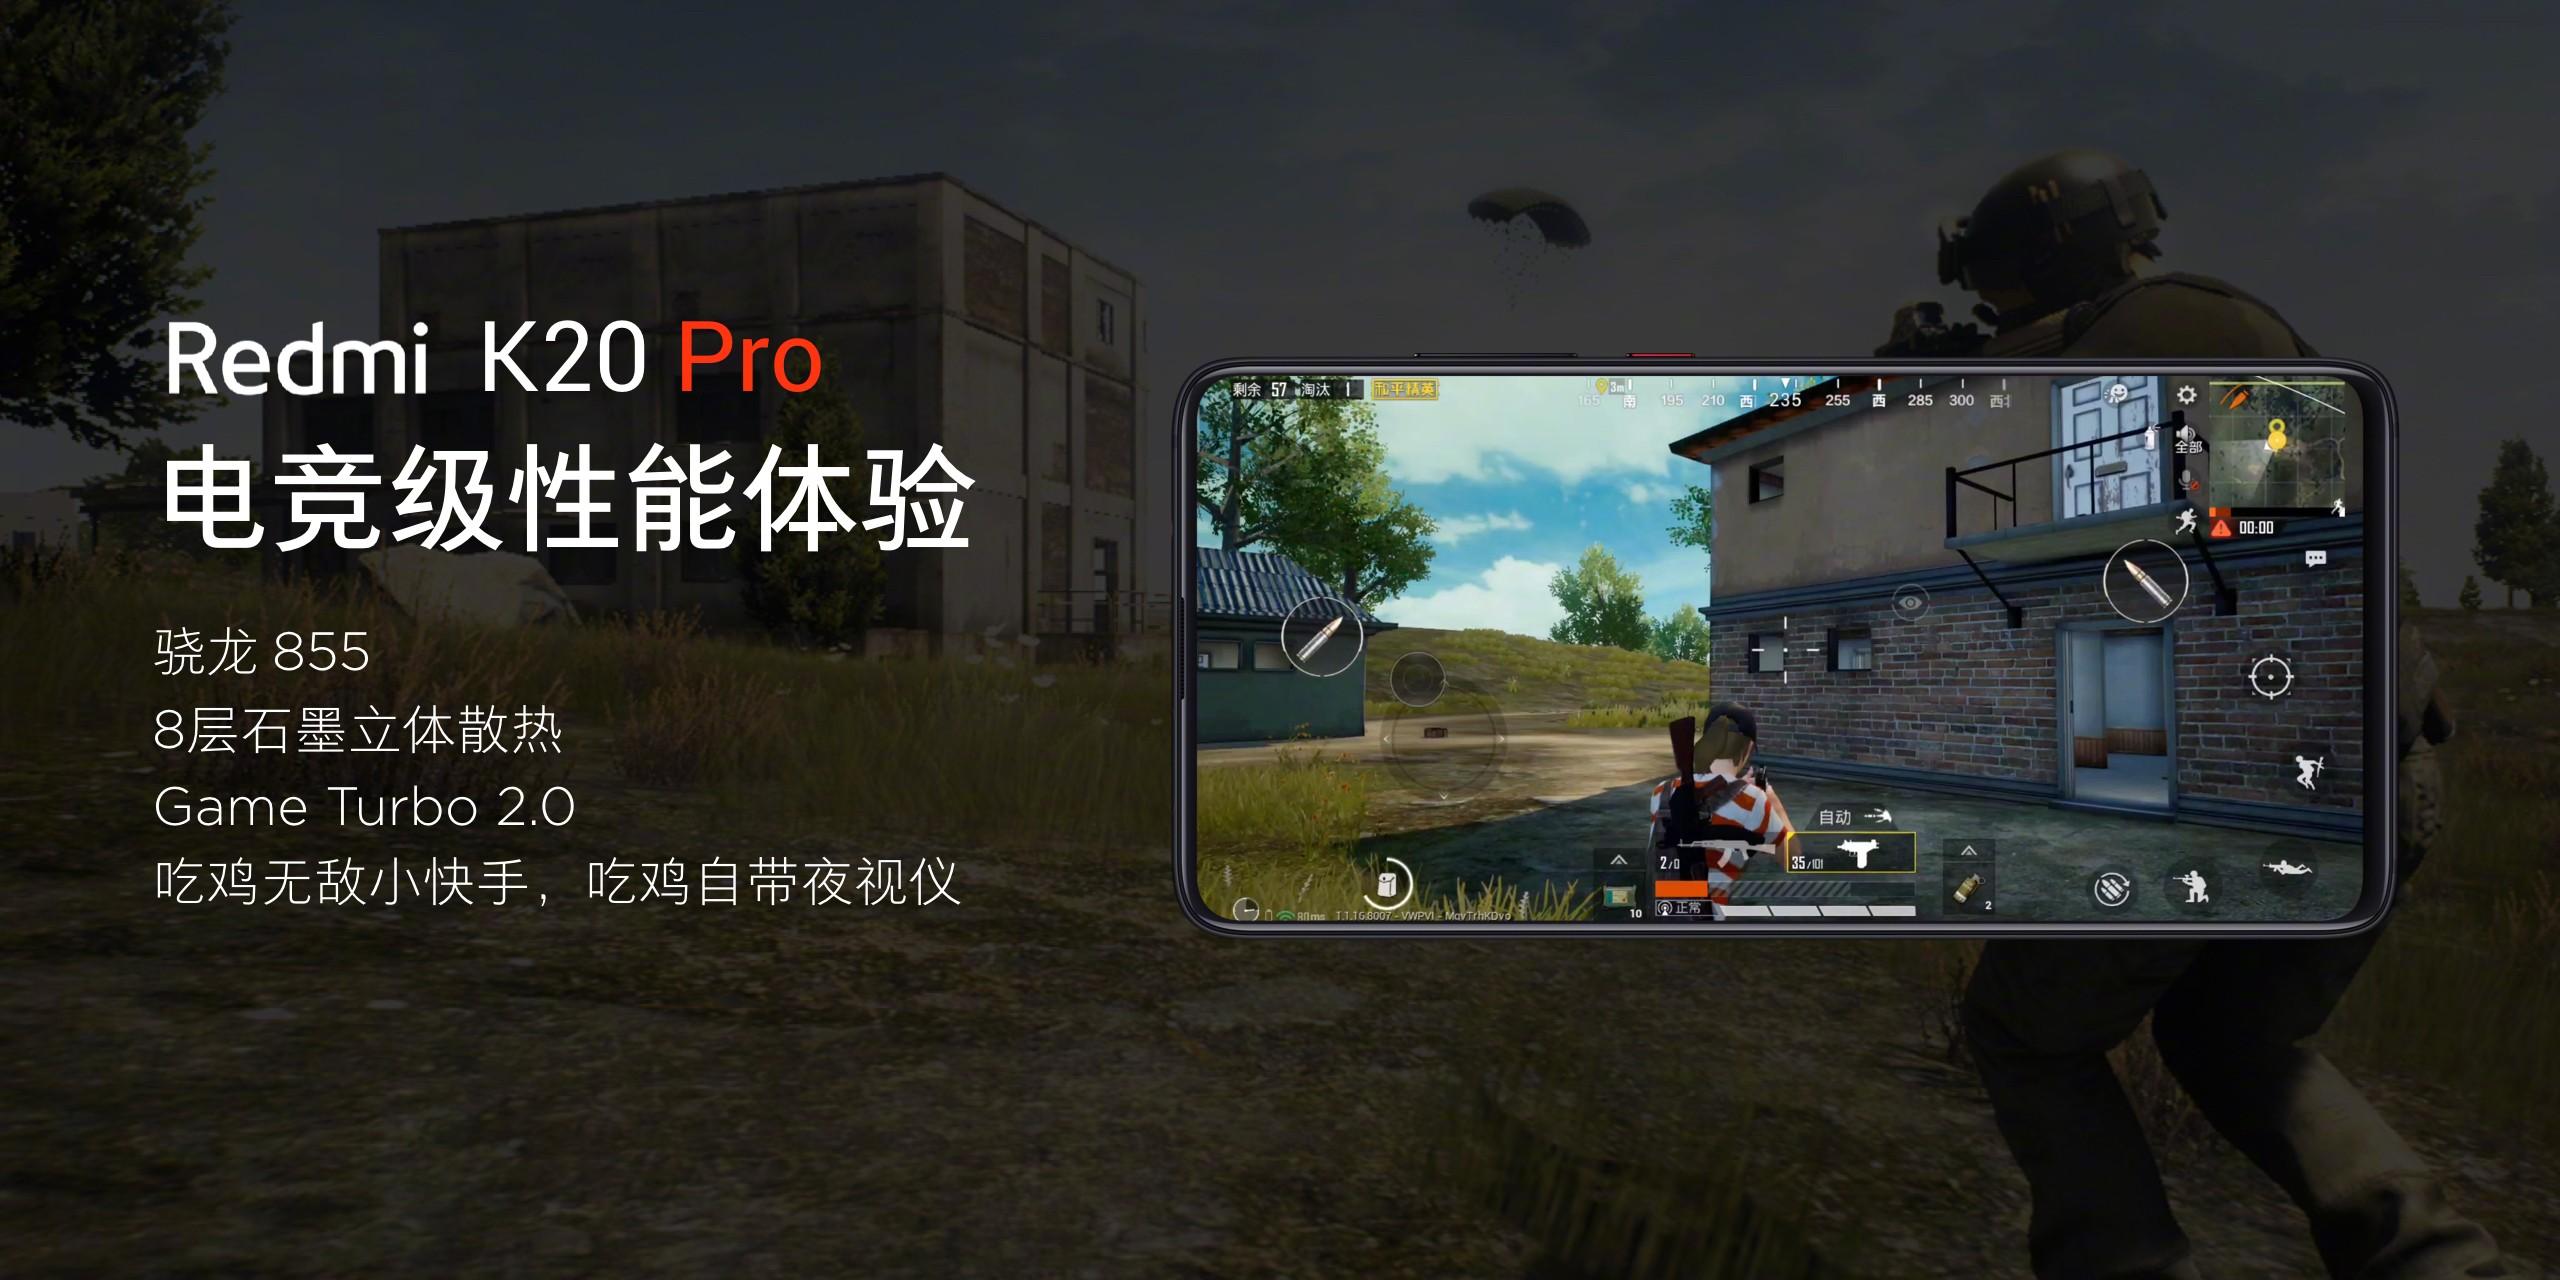 Redmi K20 Pro Performance